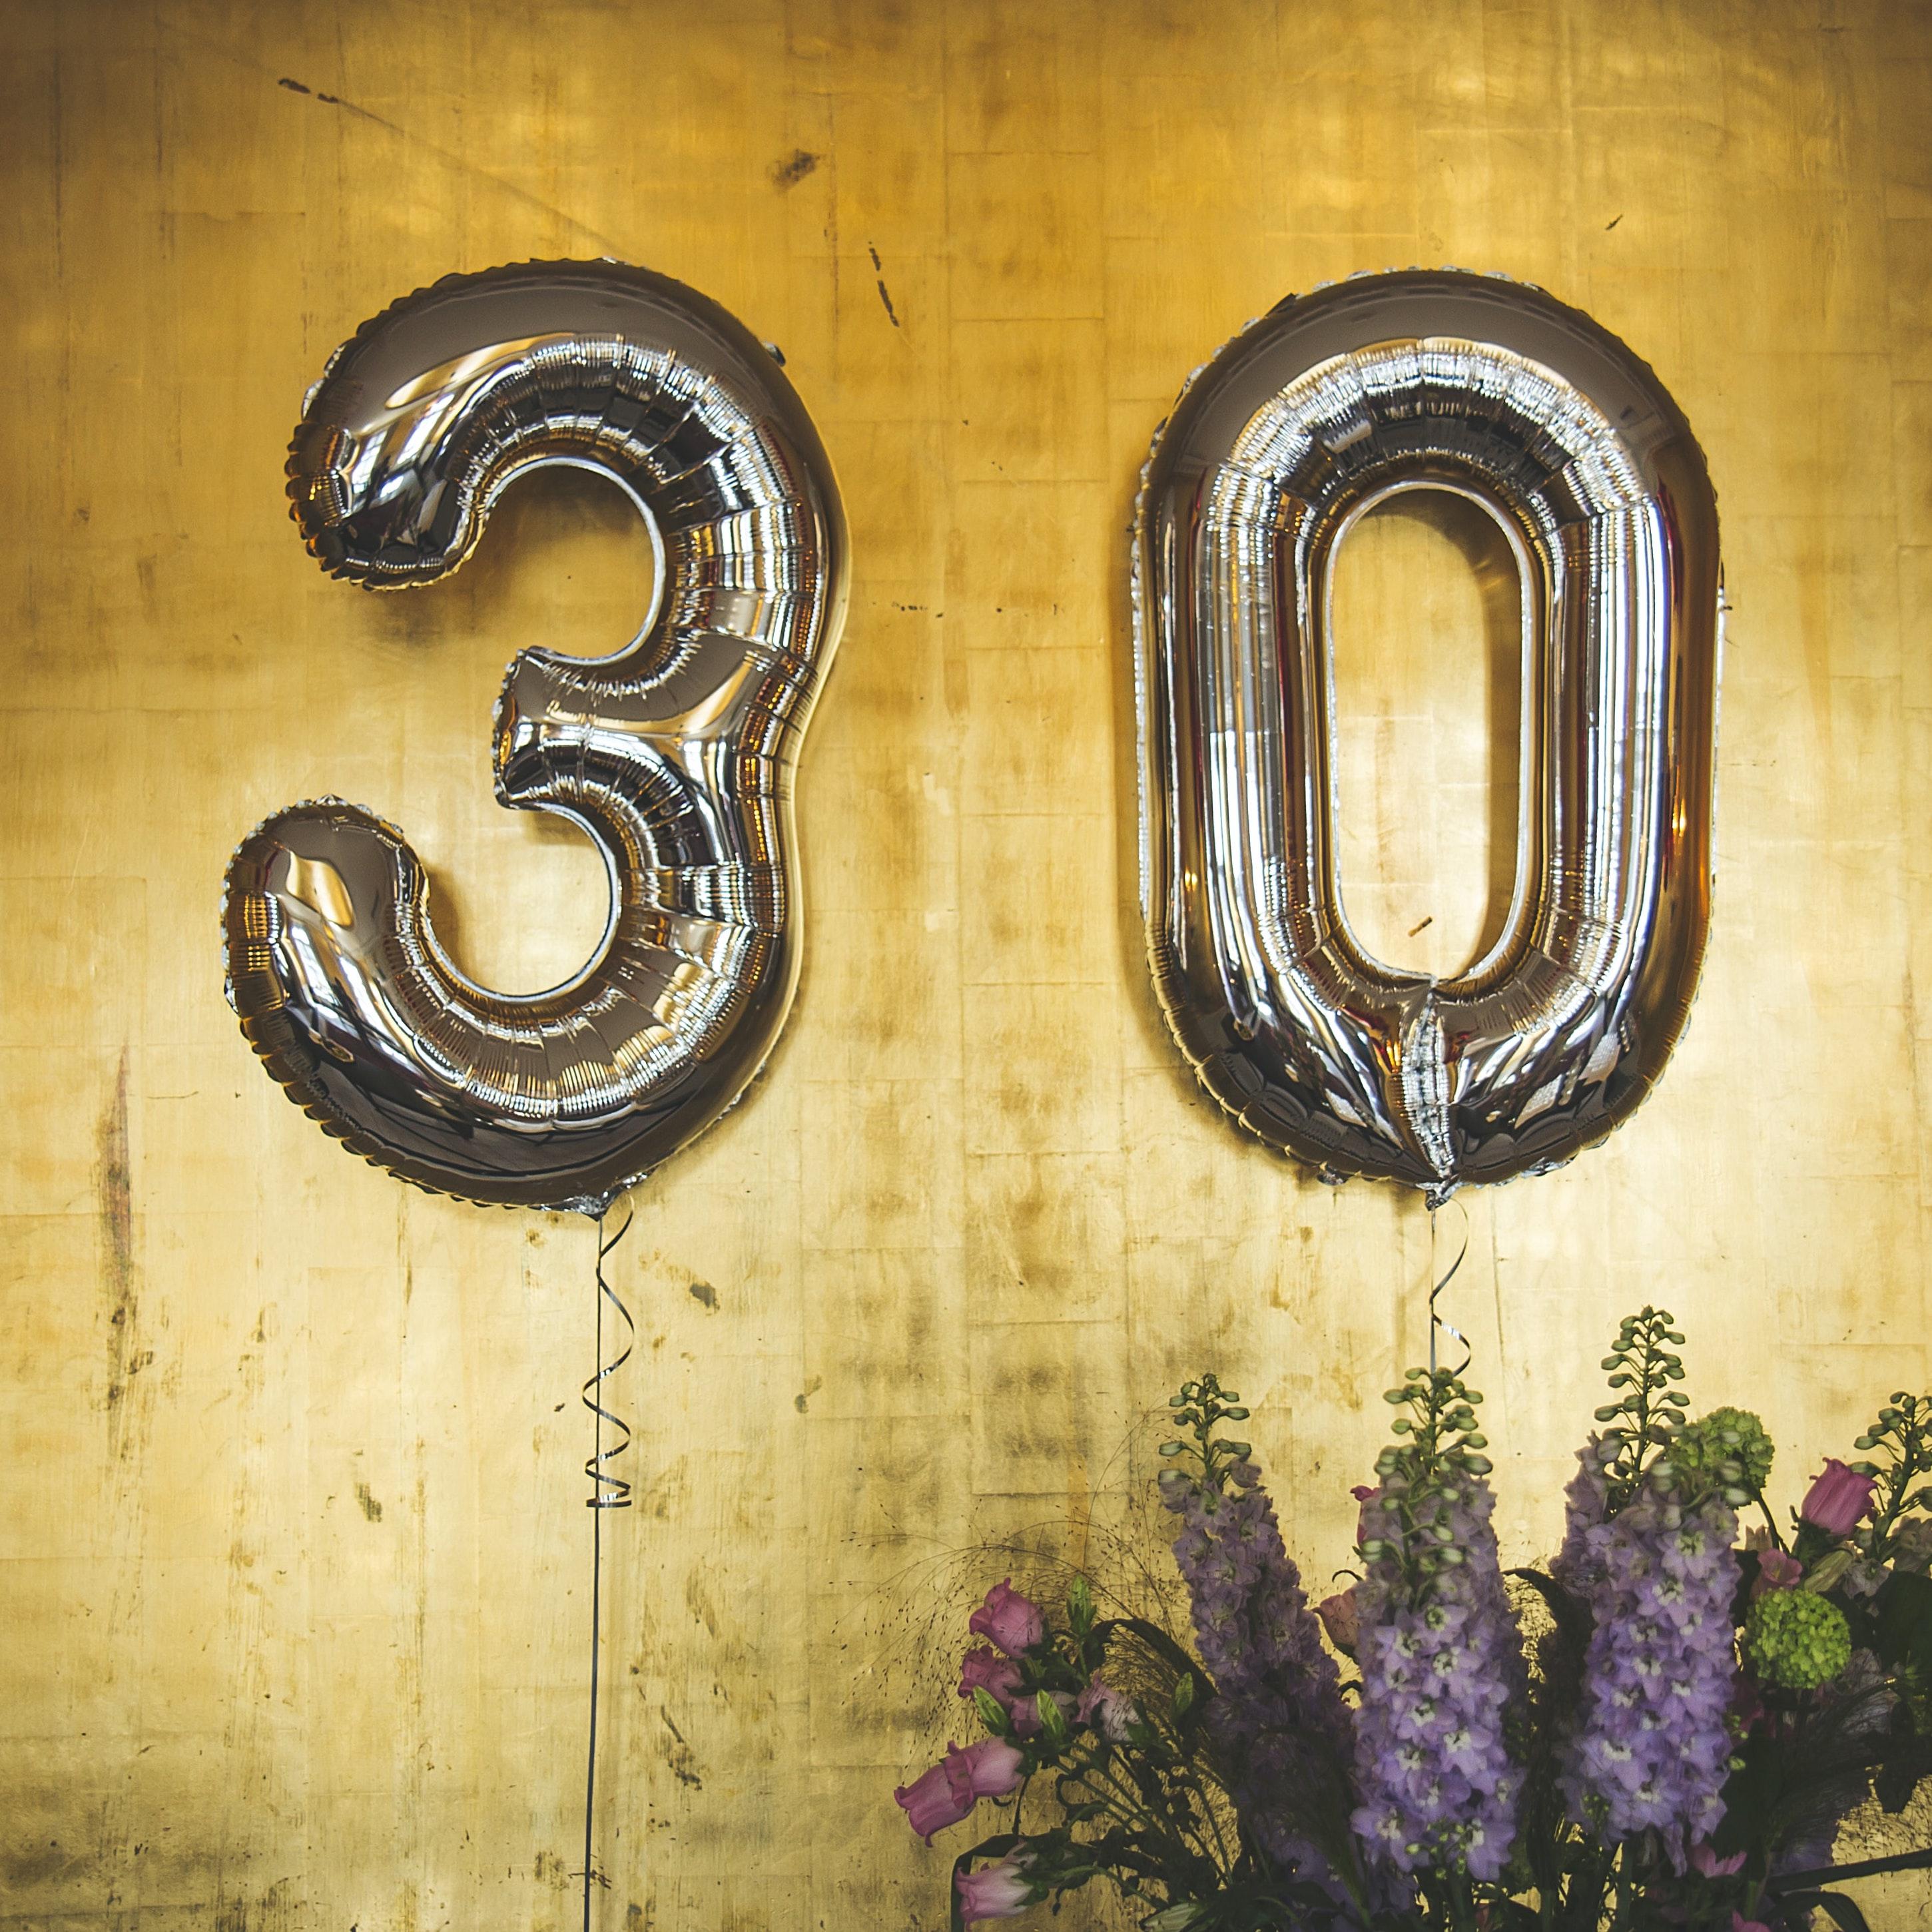 30-balloons-oloni-blog